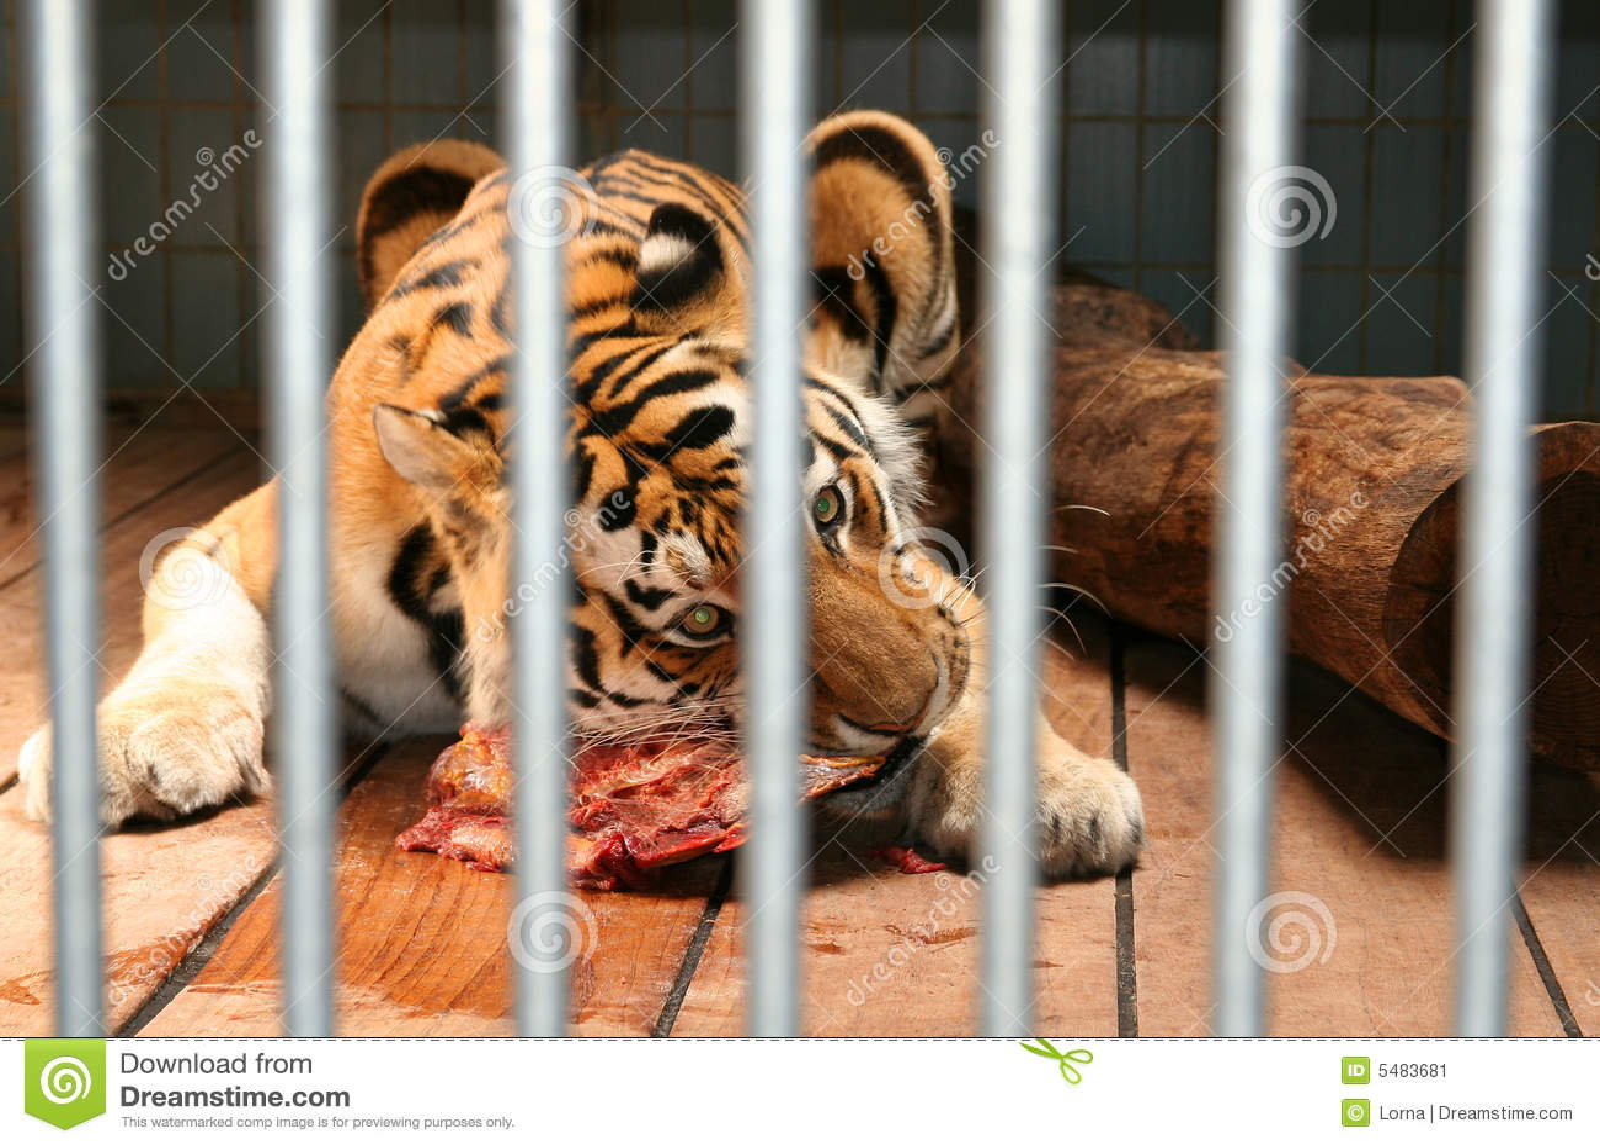 el-tigre-come-la-jaula-de-la-carne-54836